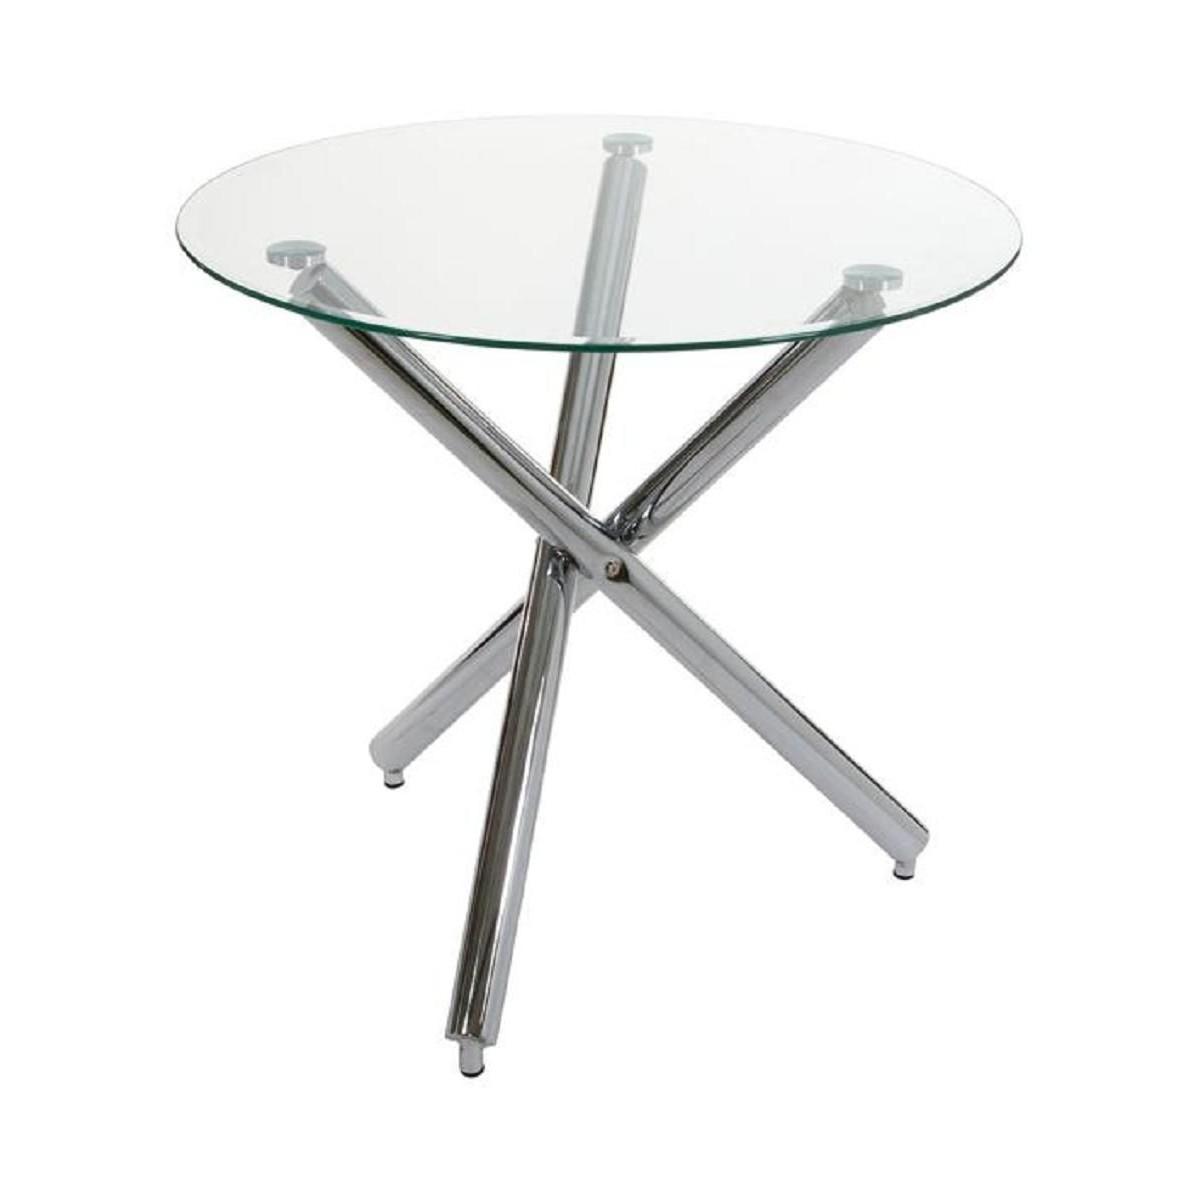 Mesa de comedor moderna redonda cristal de santiago pons - Mesa comedor cristal redonda ...